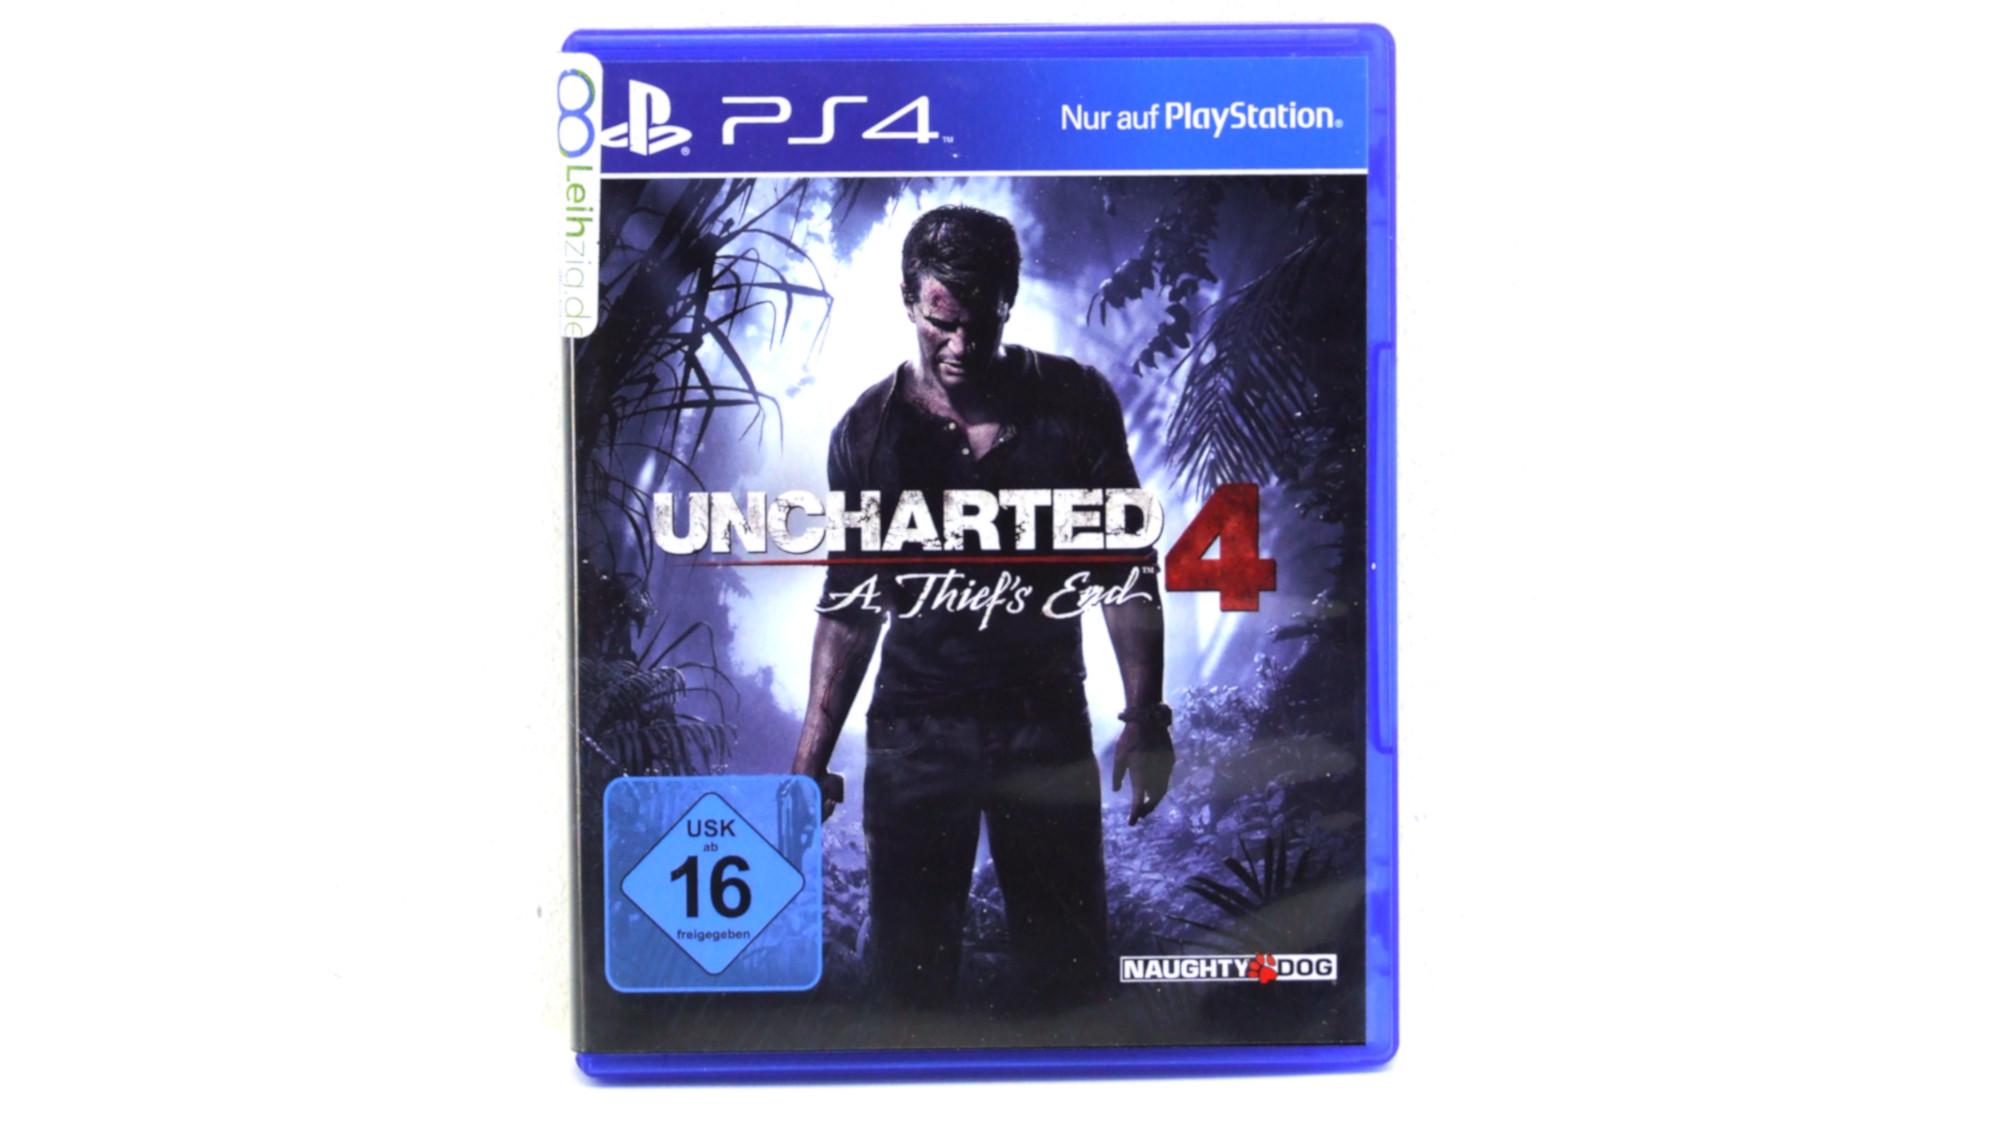 Spiel: Uncharted 4: A Thief's End leihen